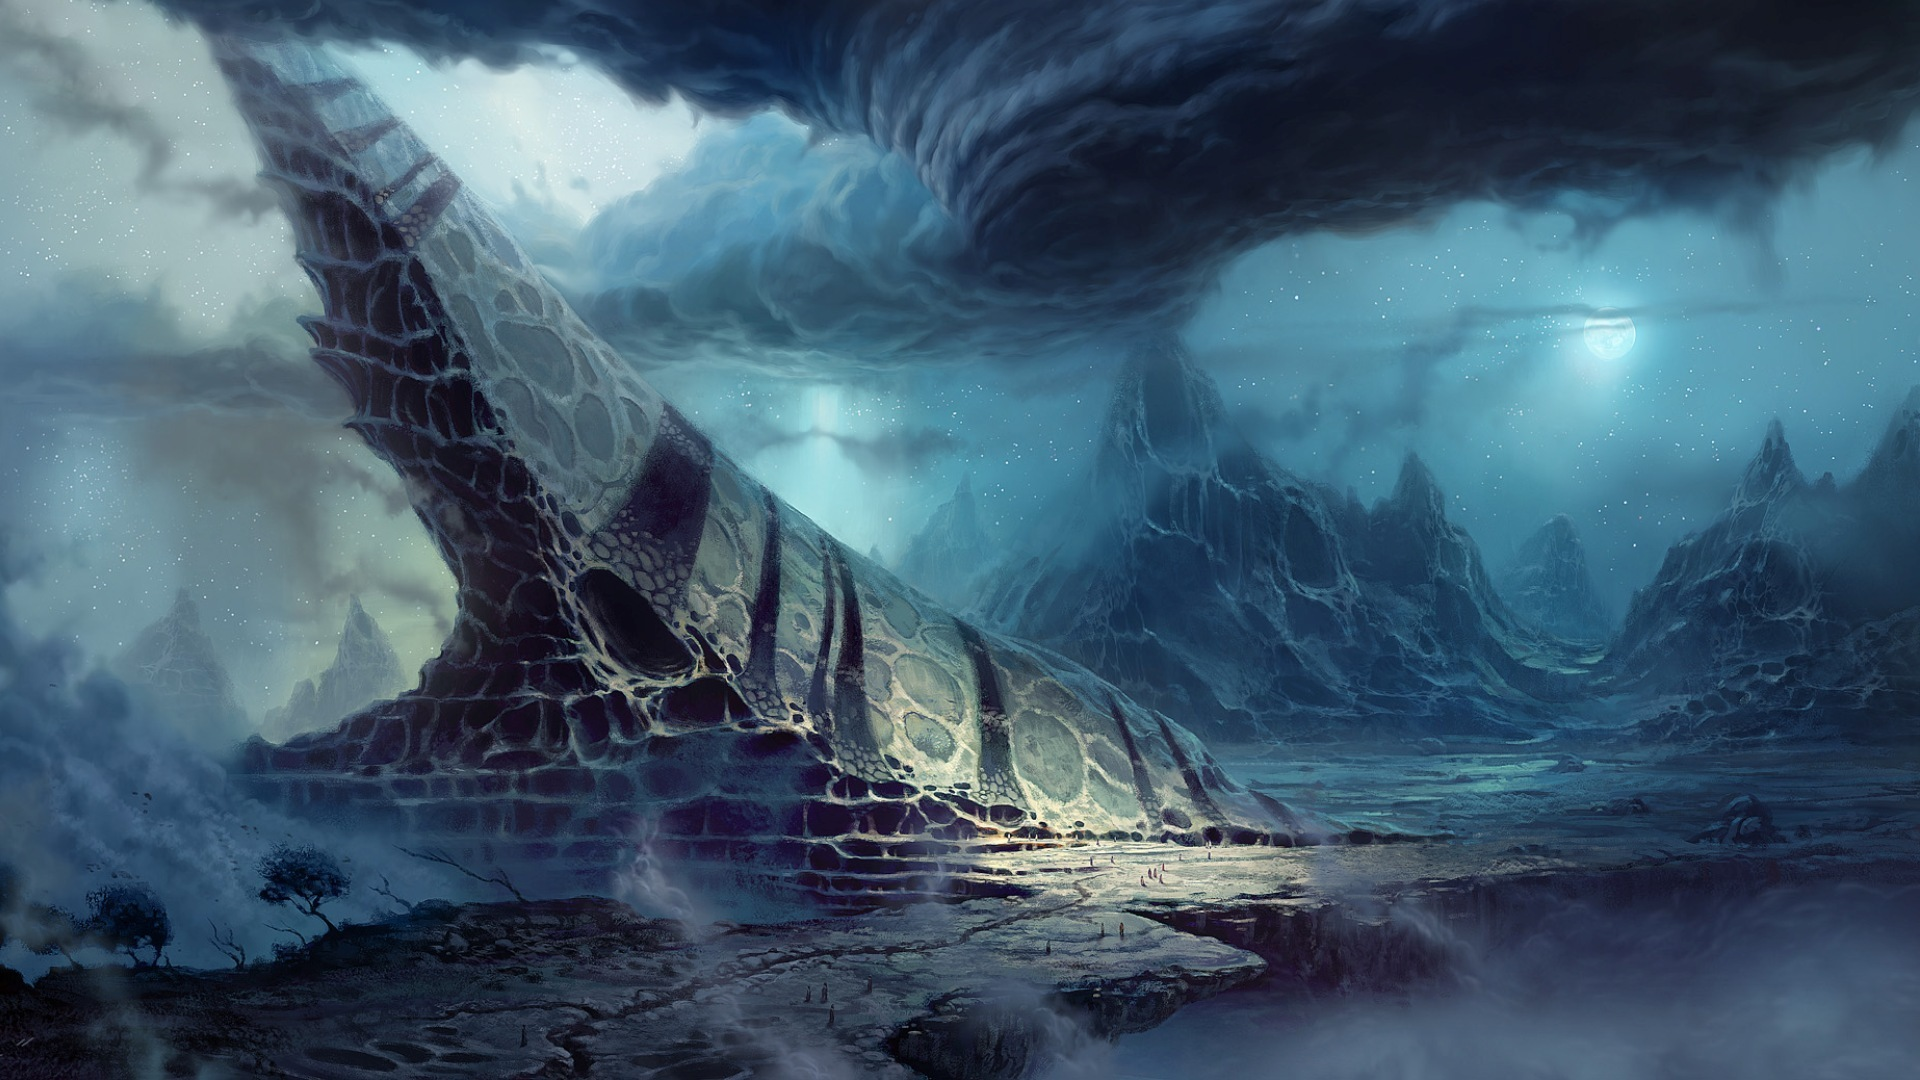 alien landscapes fantasy - HD1920×1080